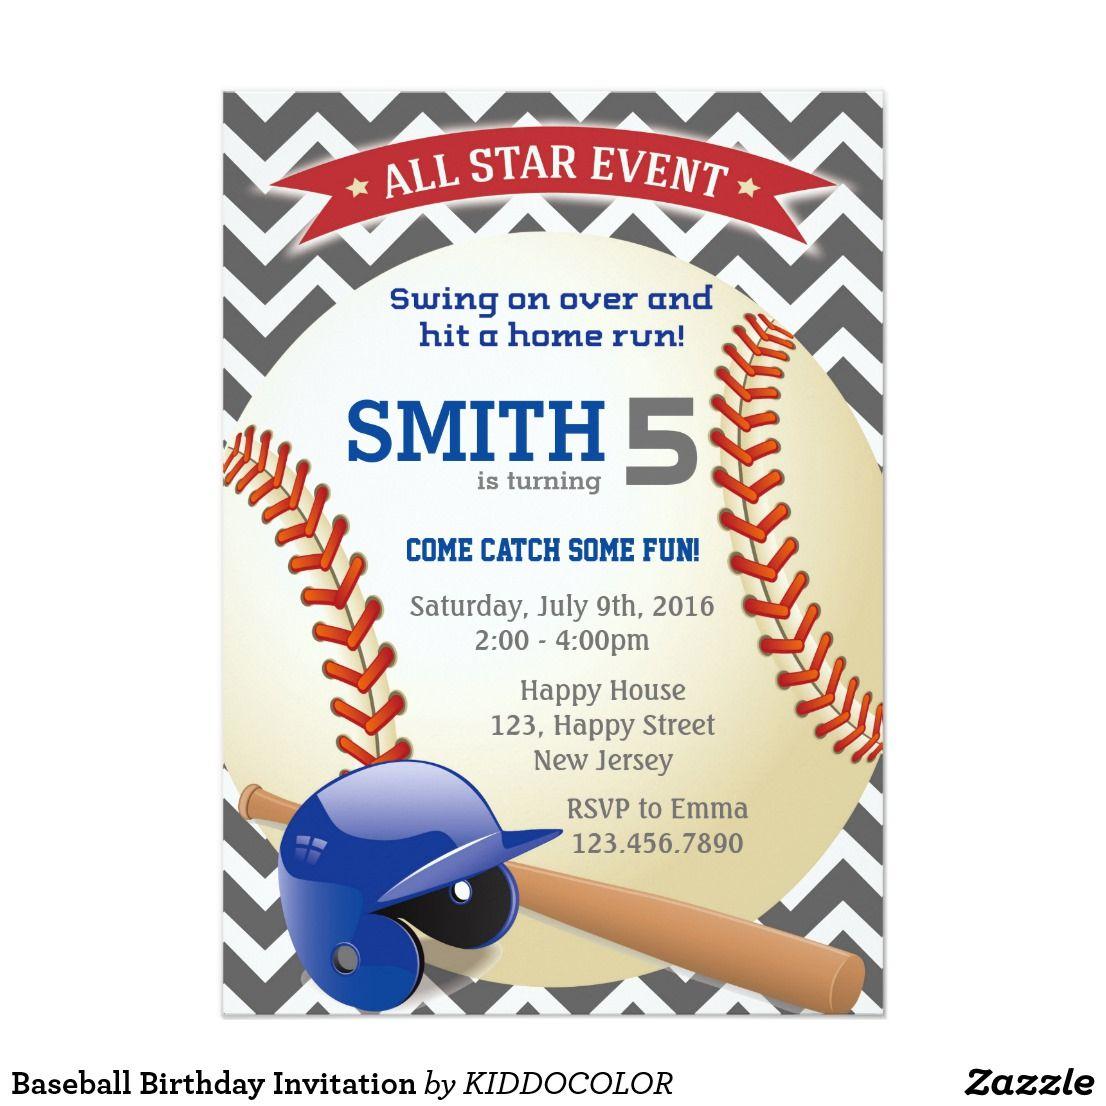 Baseball Birthday Invitation | Pinterest | Baseball birthday ...